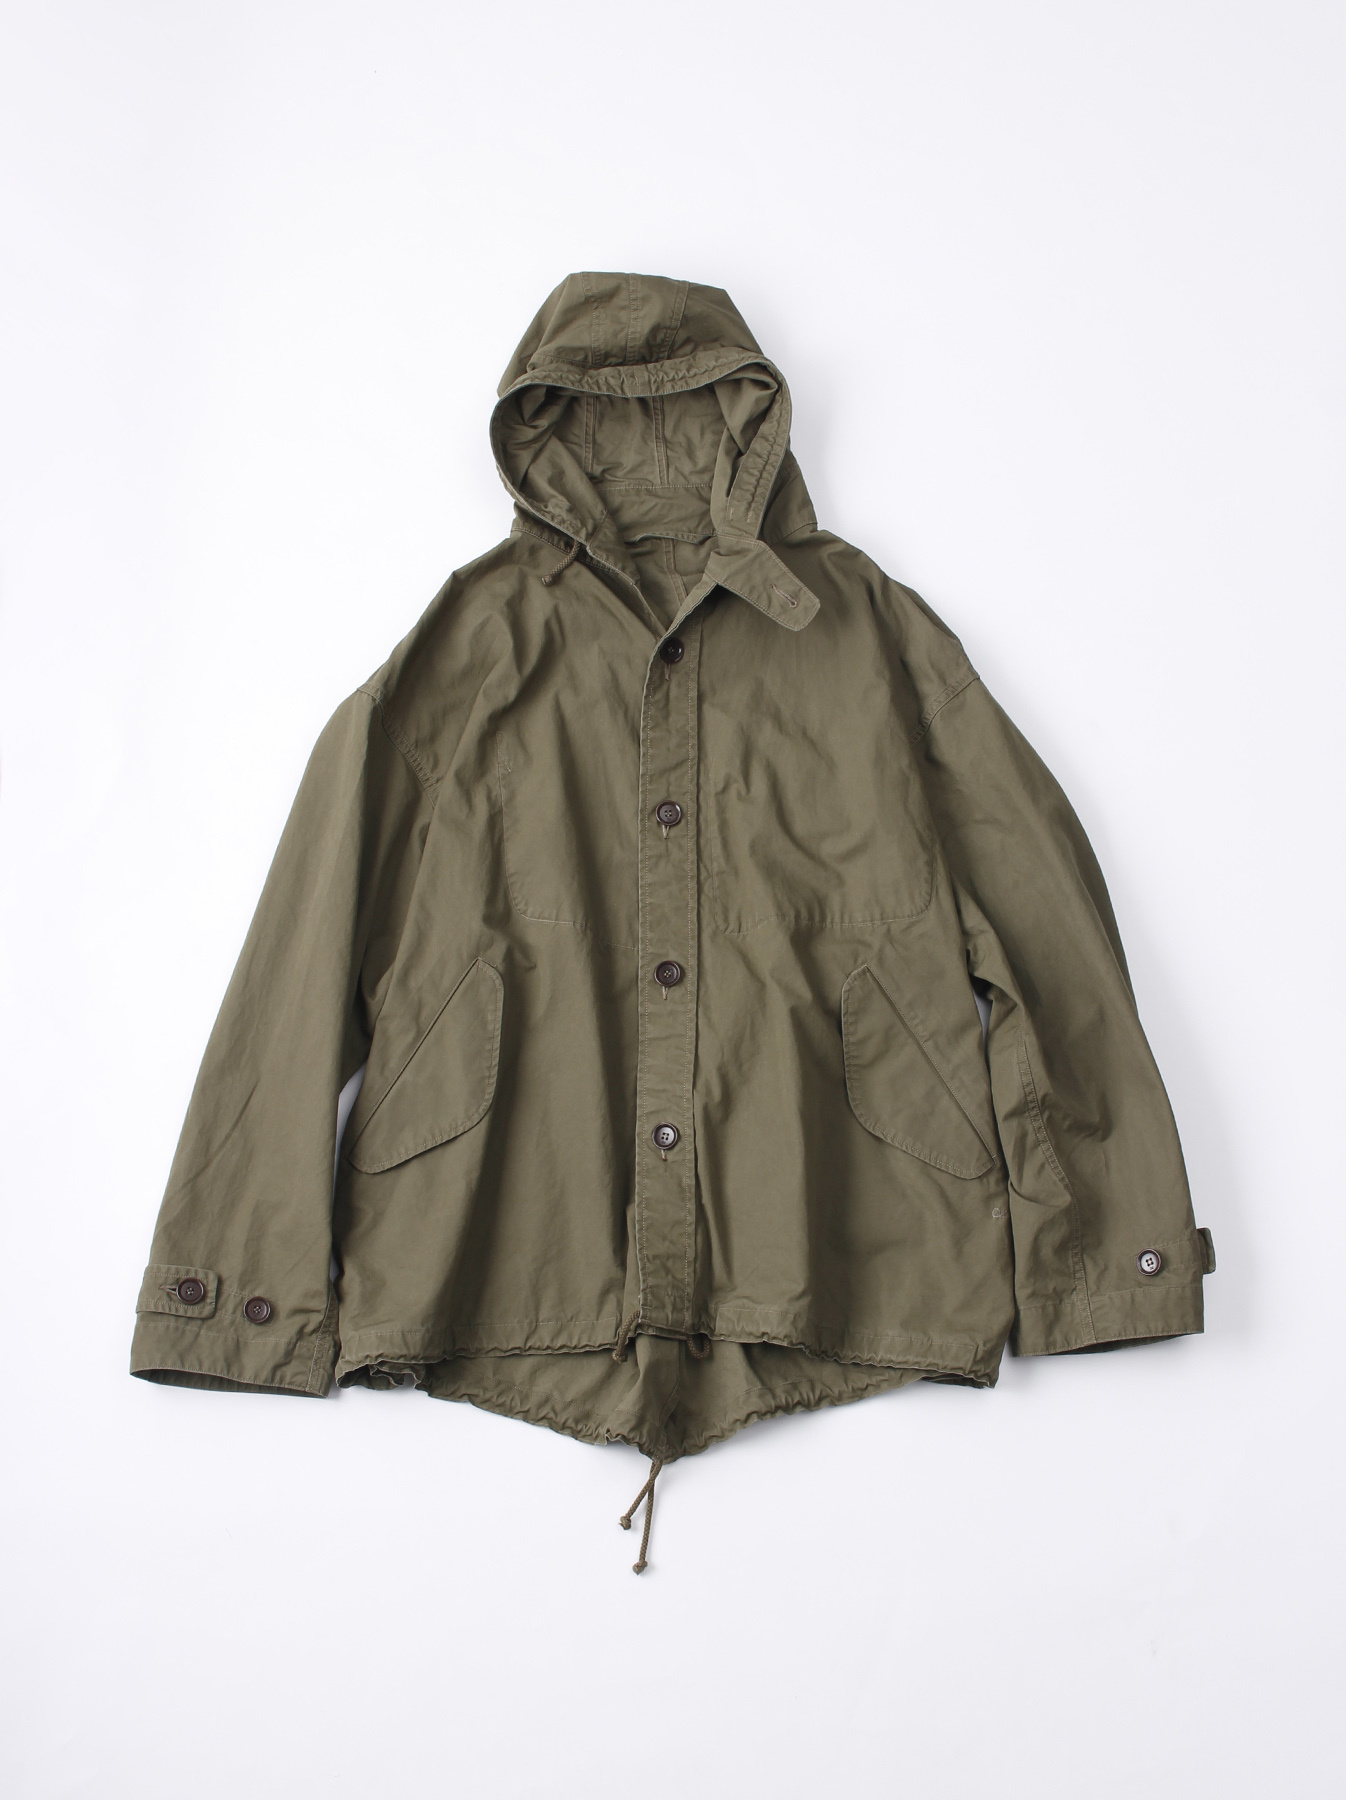 Weather Cloth Umahiko Mods Hoodie-6